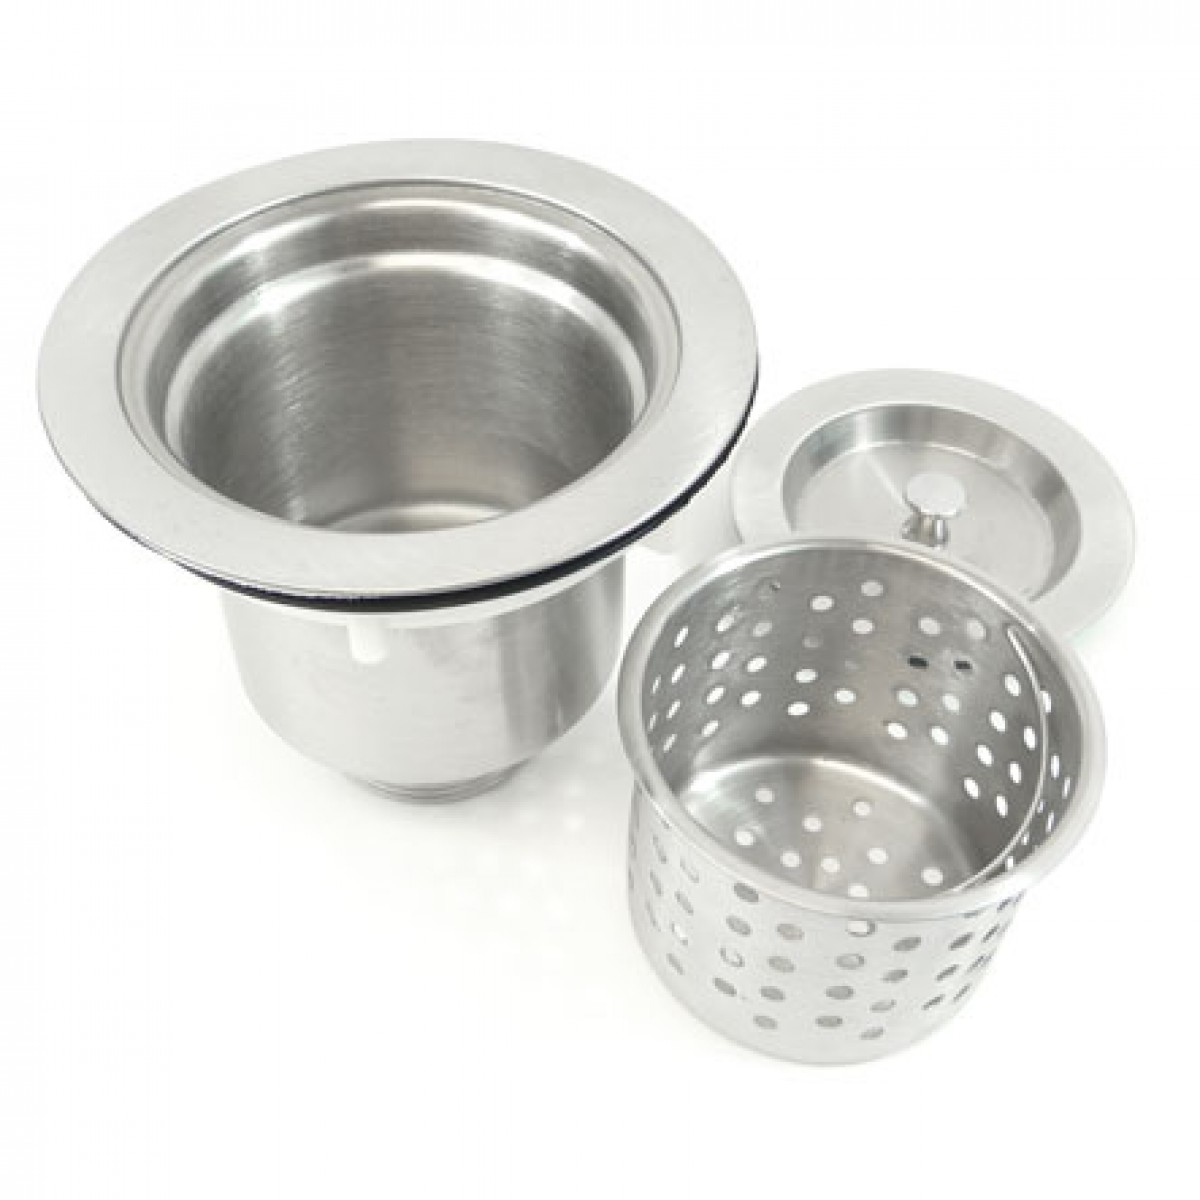 Kitchen Sink Strainer Basket Kitchen bar sink basket strainer with lift out basket workwithnaturefo